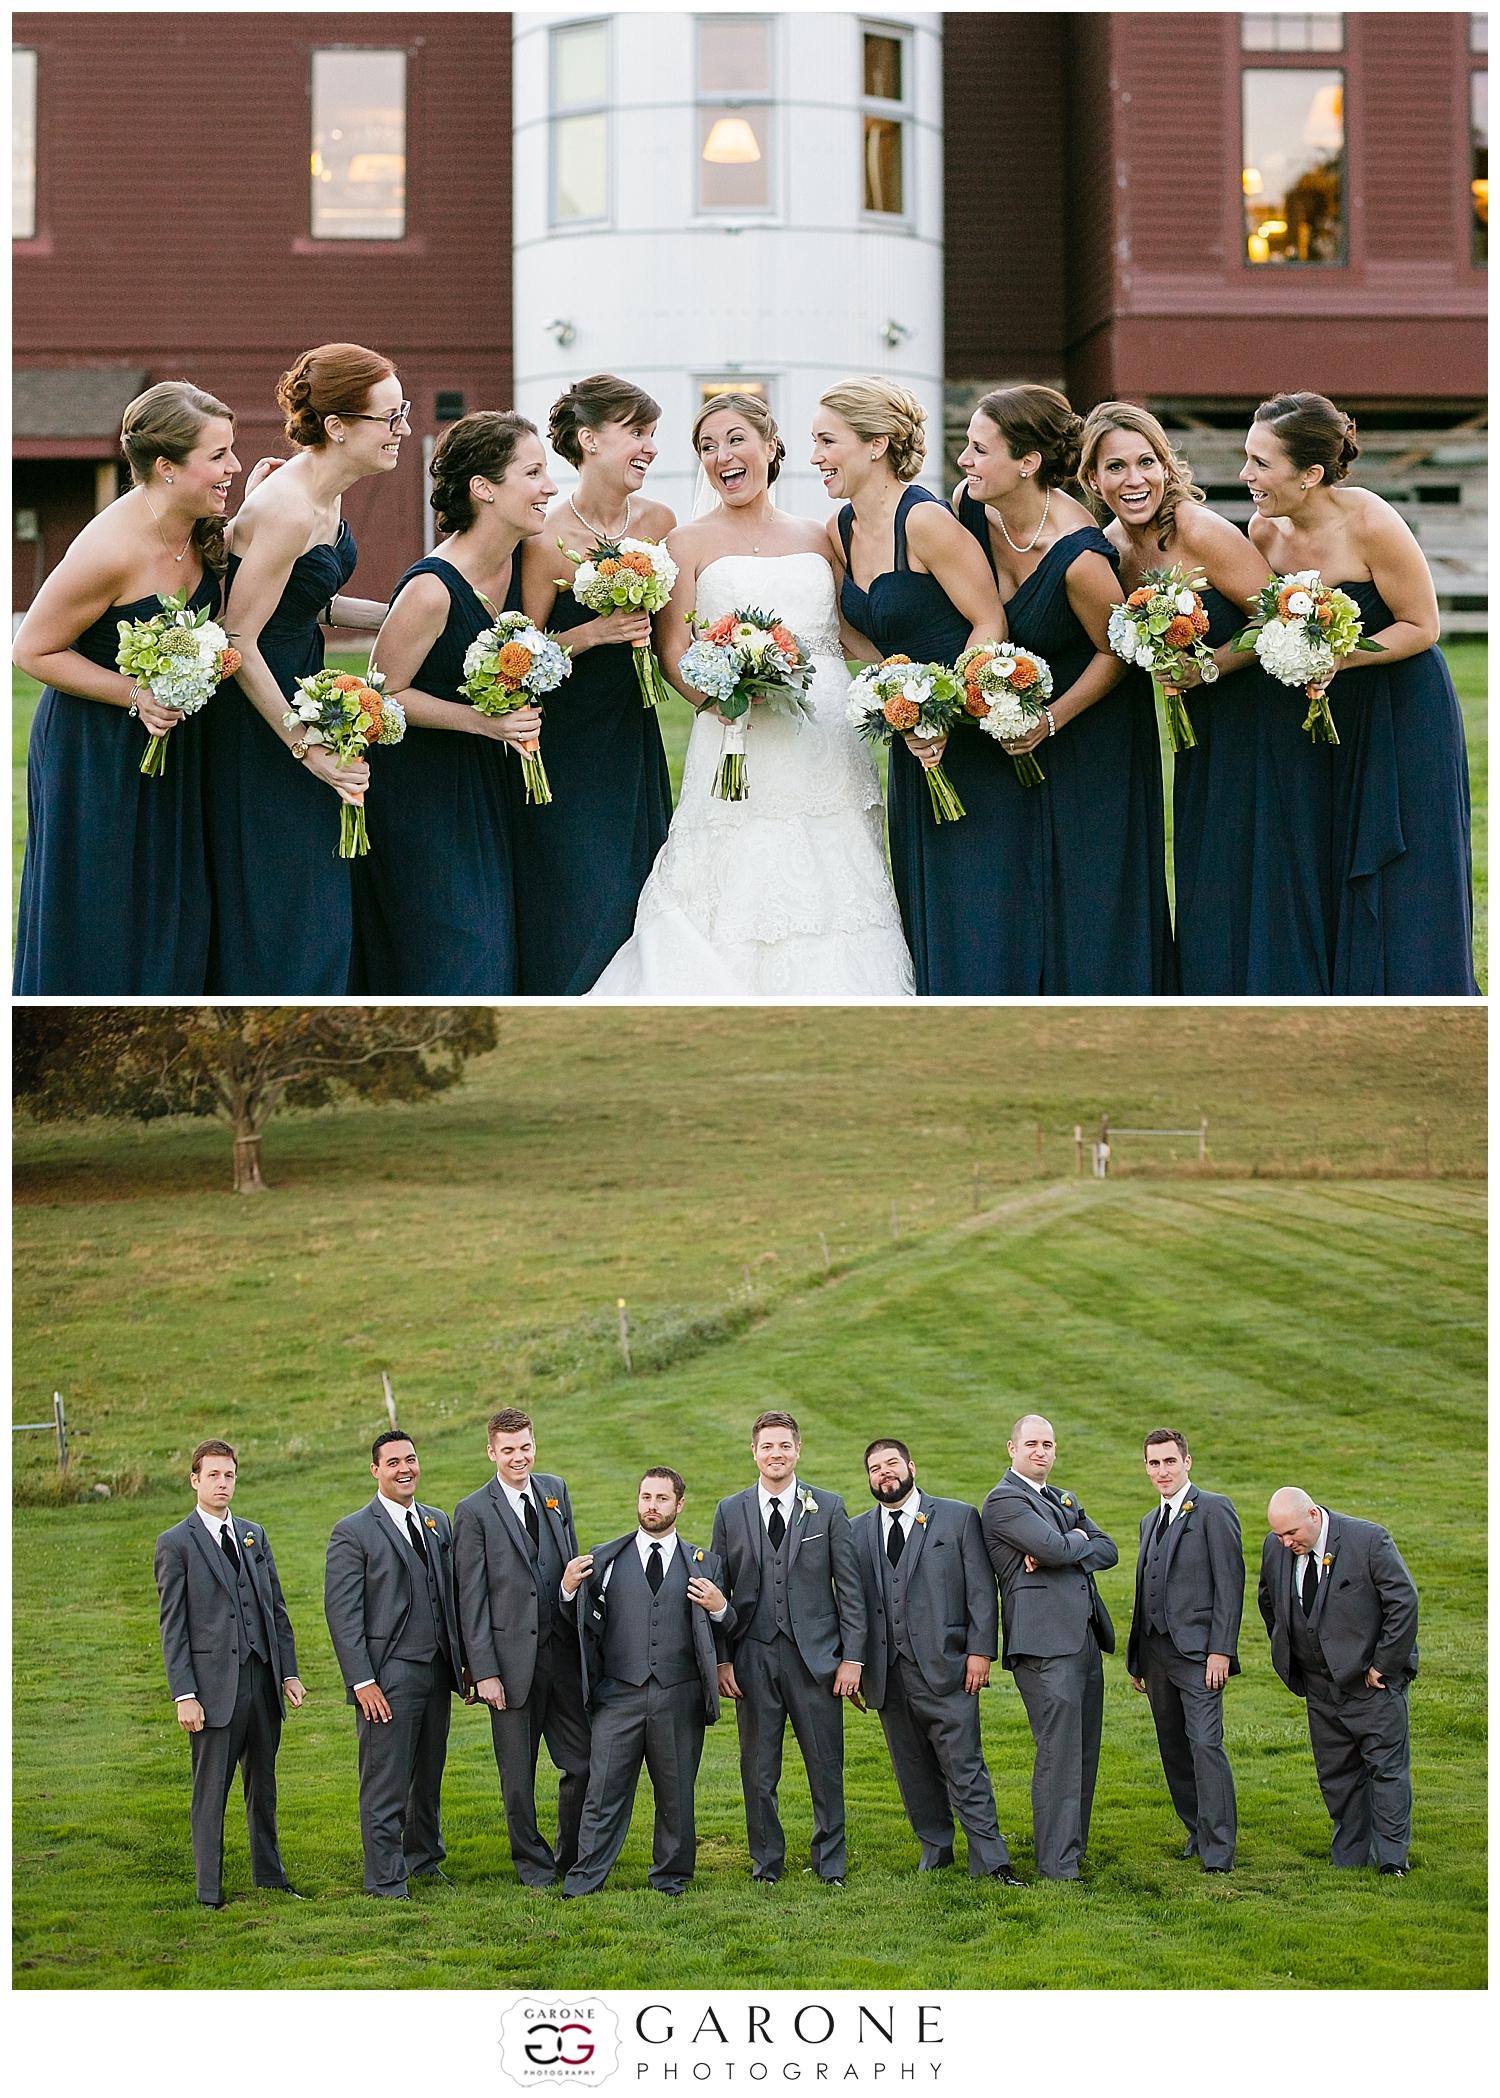 Groton country club wedding